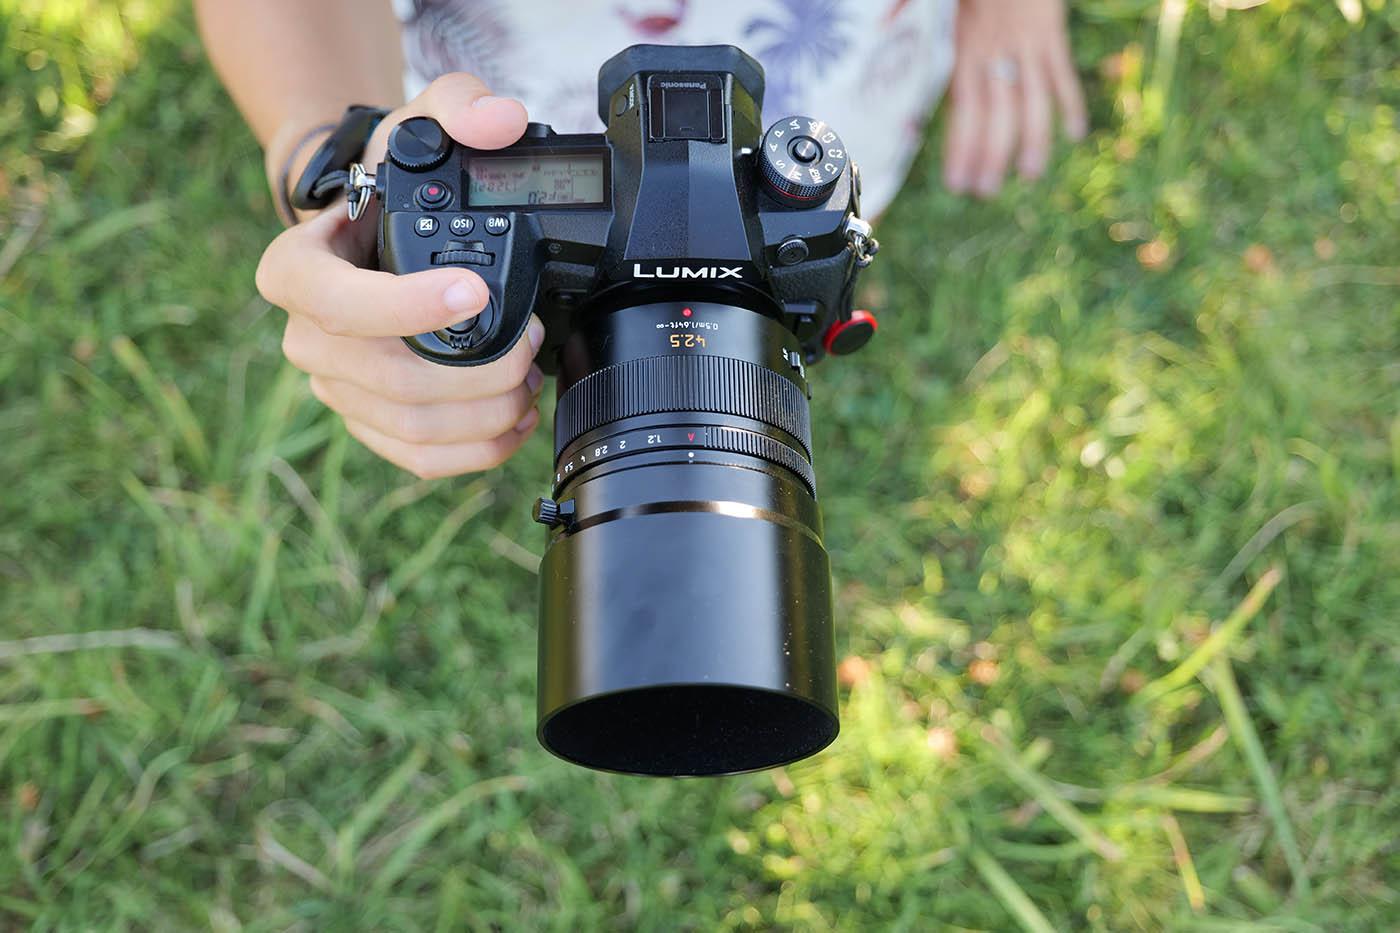 Panasonic Leica 42.5 mm f1.2 test